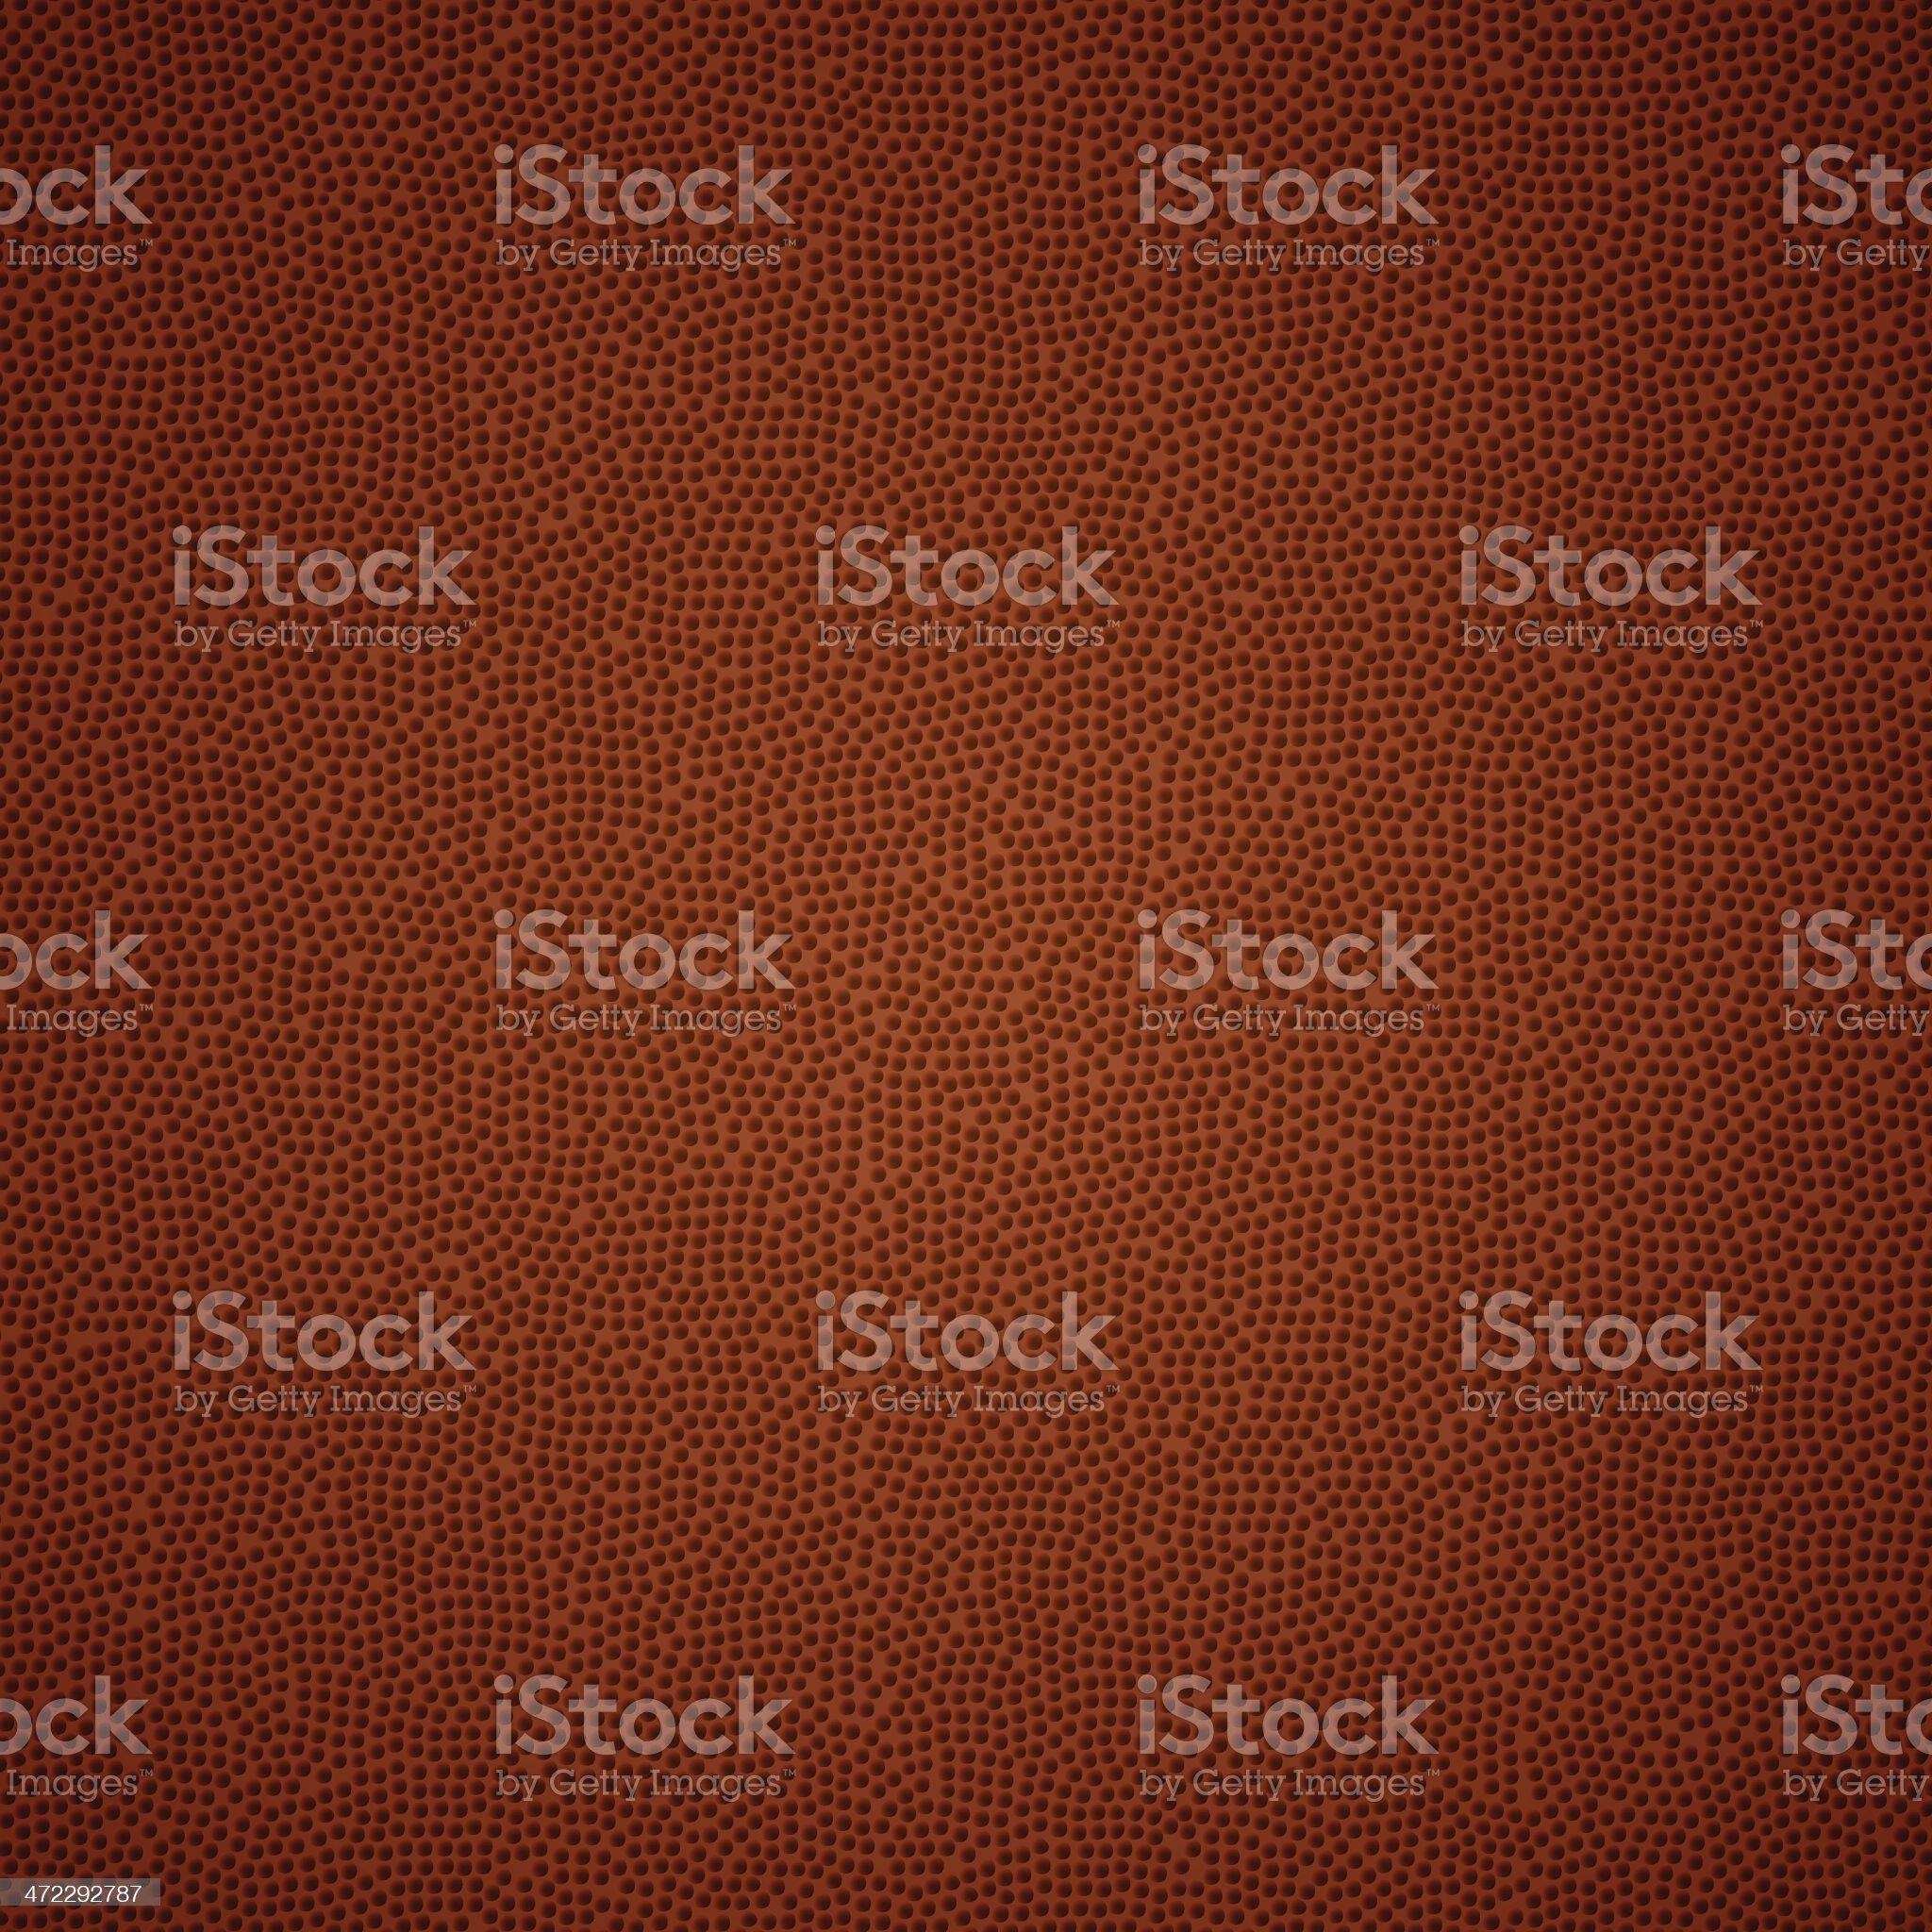 American Football Texture royalty-free stock vector art